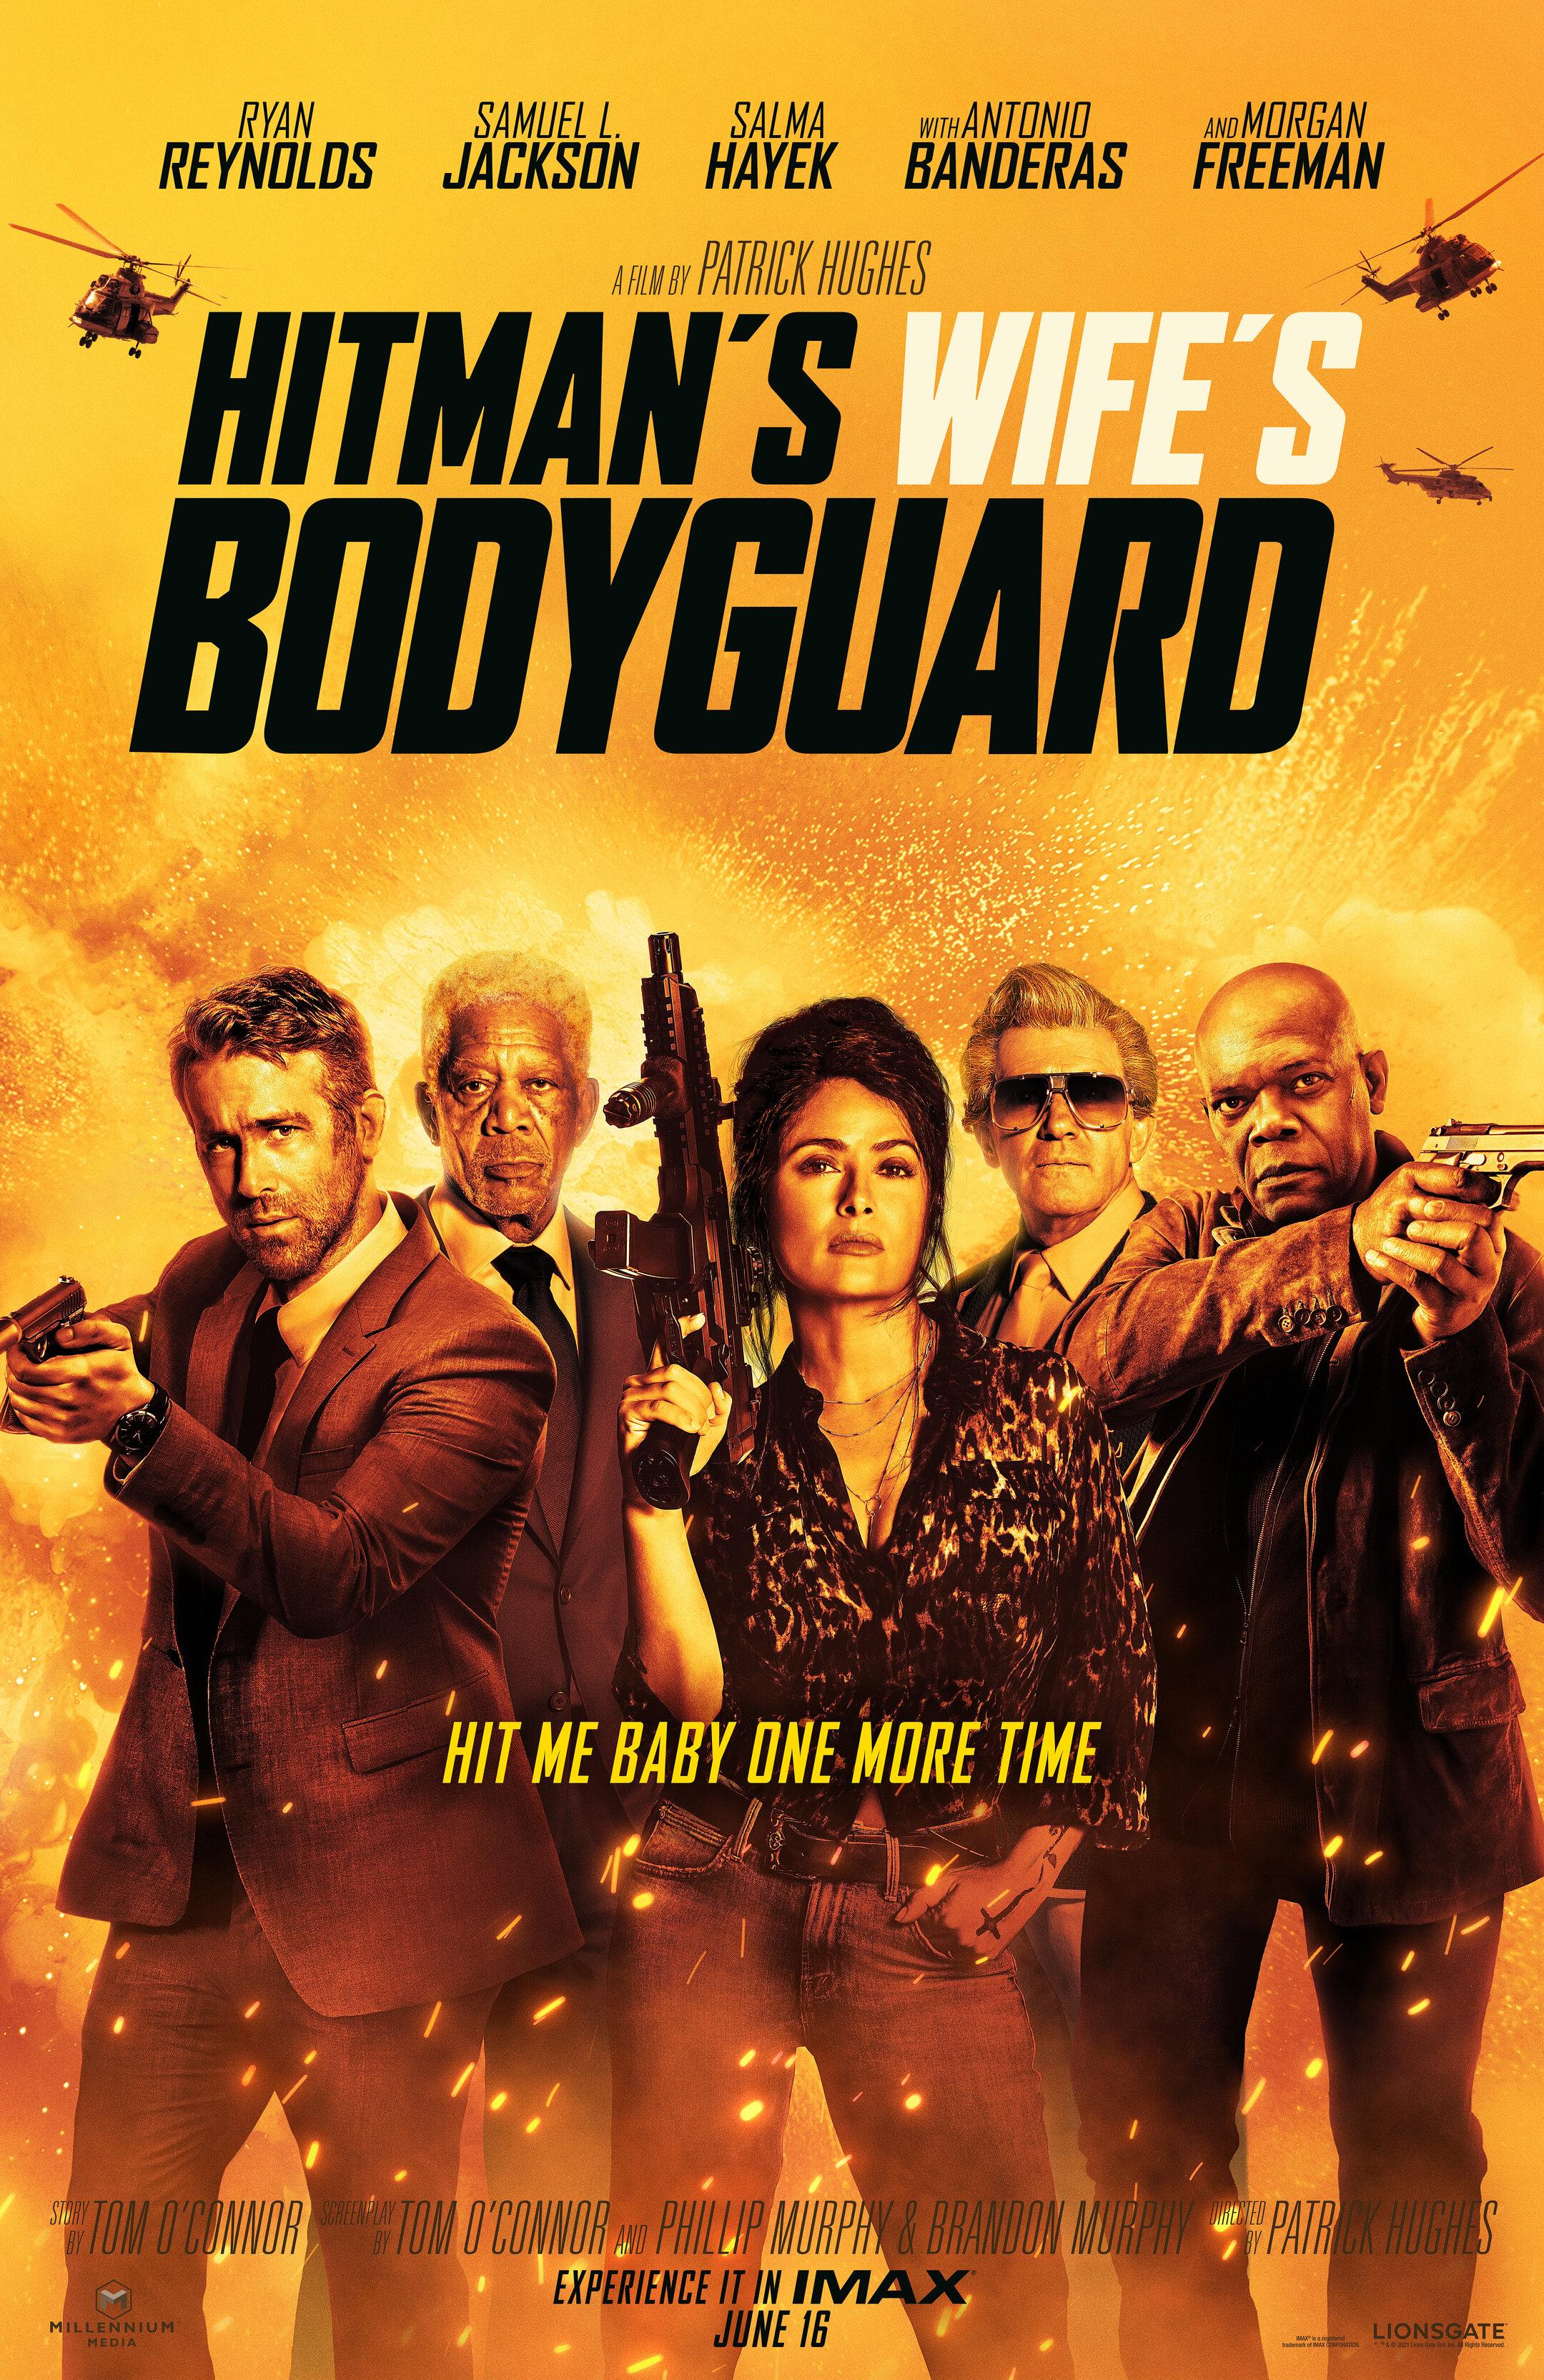 Hitman's Wife's Bodyguard, Ryan Reynolds, Samuel L. Jackson, Salma Hayek, Antonio Banderas, Morgan Freeman